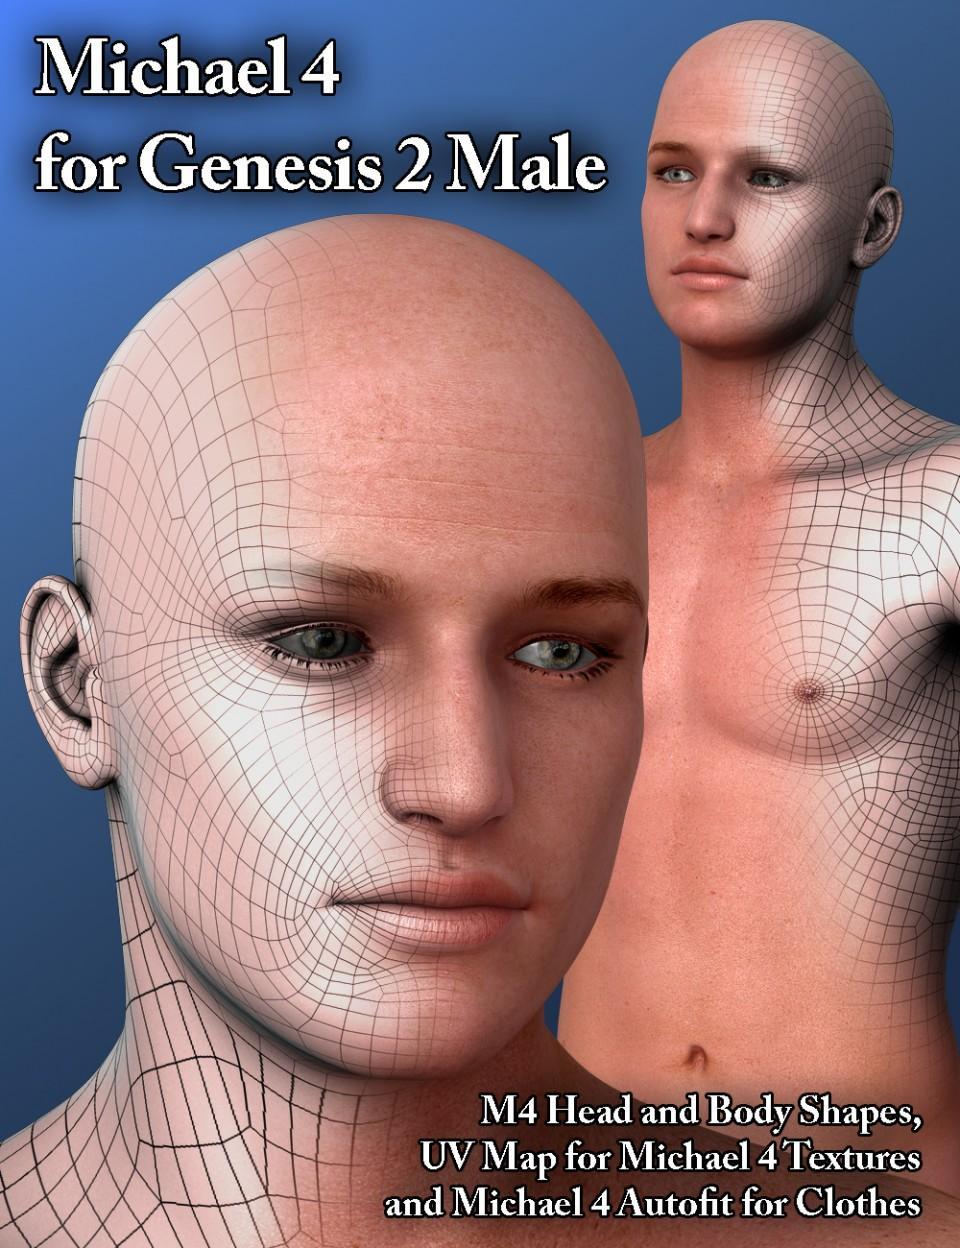 Michael 4 for Genesis 2 Male